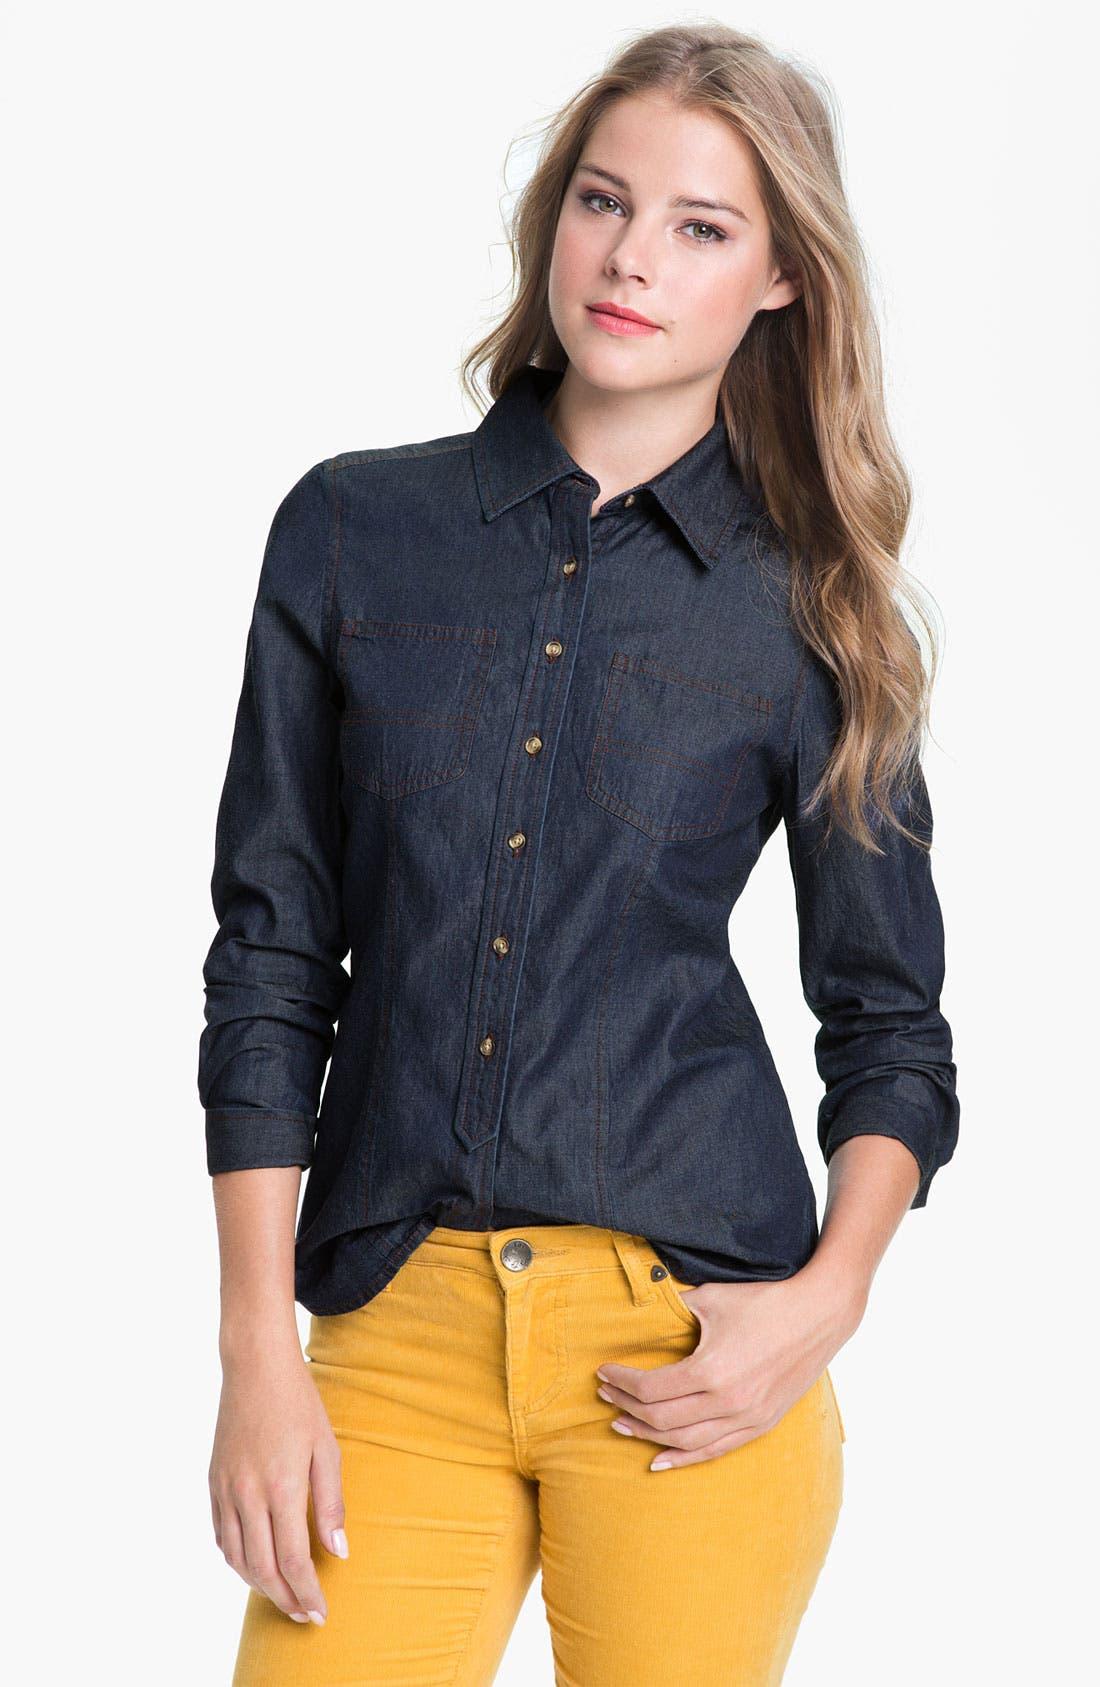 Alternate Image 1 Selected - Pendleton Denim Shirt (Online Exclusive)